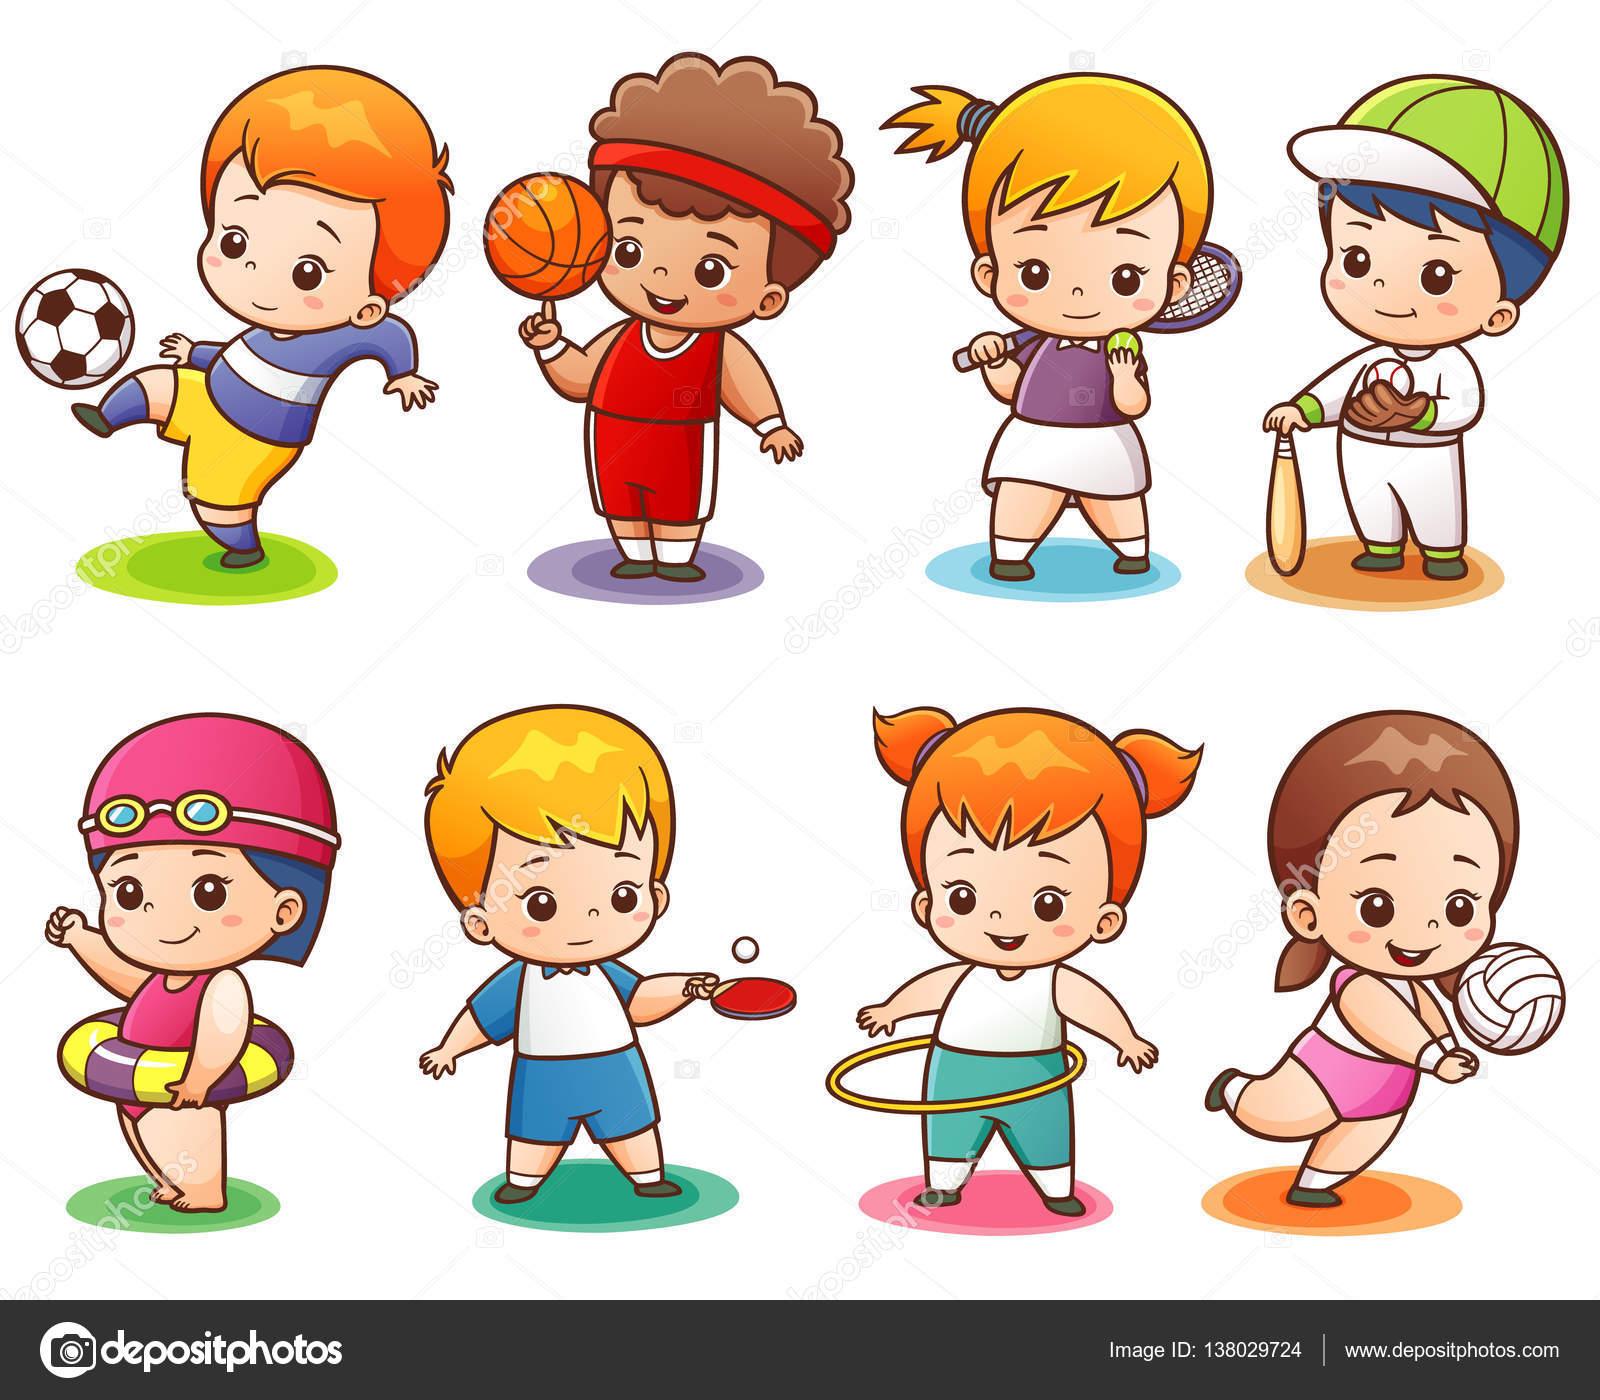 u5361 u901a u8fd0 u52a8 u4eba u7269  u56fe u5e93 u77e2 u91cf u56fe u50cf u00a9 sararoom 138029724 child clipart mirror child clipart god